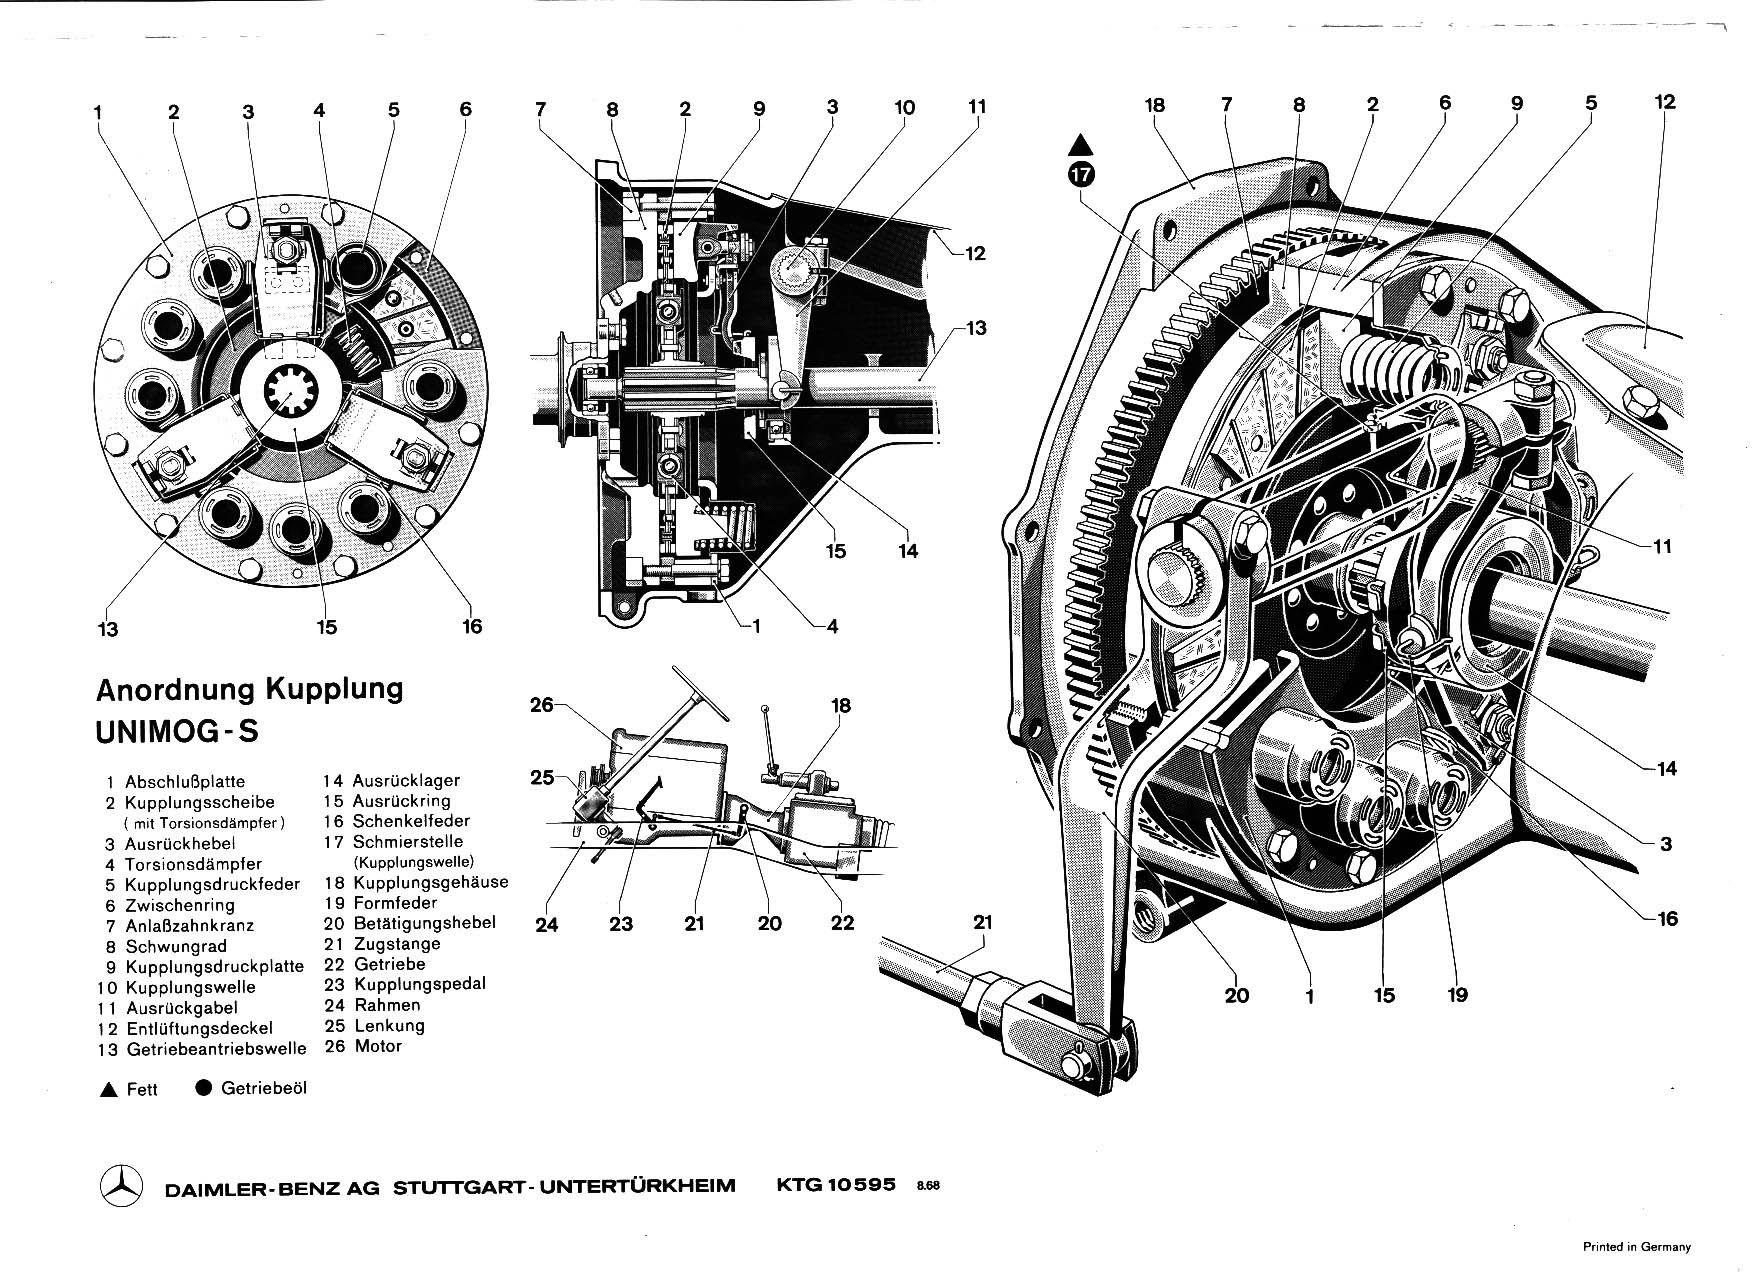 Unimog Drawing  Clutch Kupplung  4x4  Pinterest  Engine 4x4